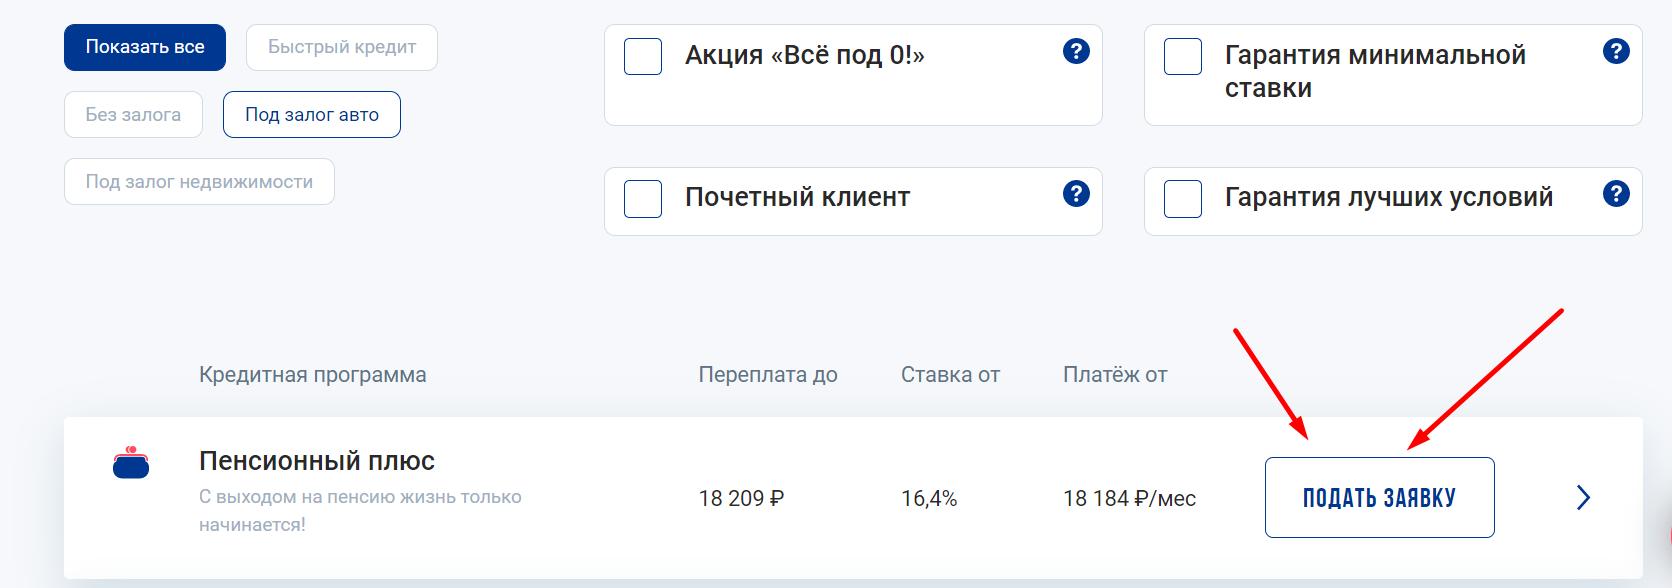 совкомбанк оставить заявку на кредит онлайн омск